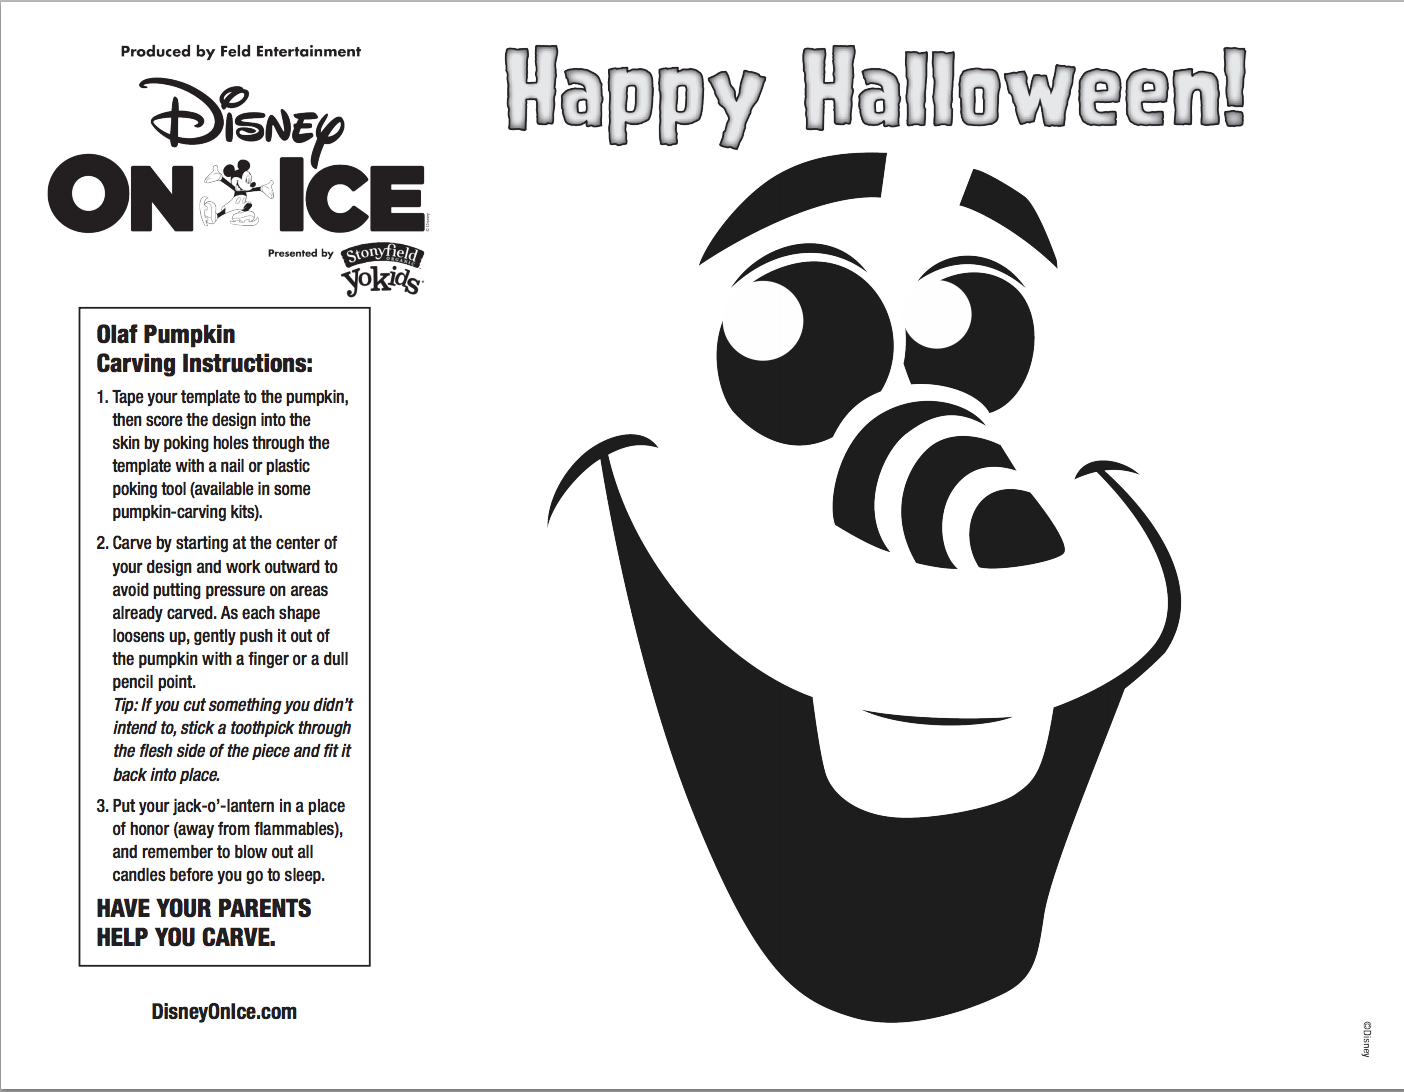 Free Disney Pumpkin Carving Templates - Free Pumpkin Carving Patterns Disney Printable